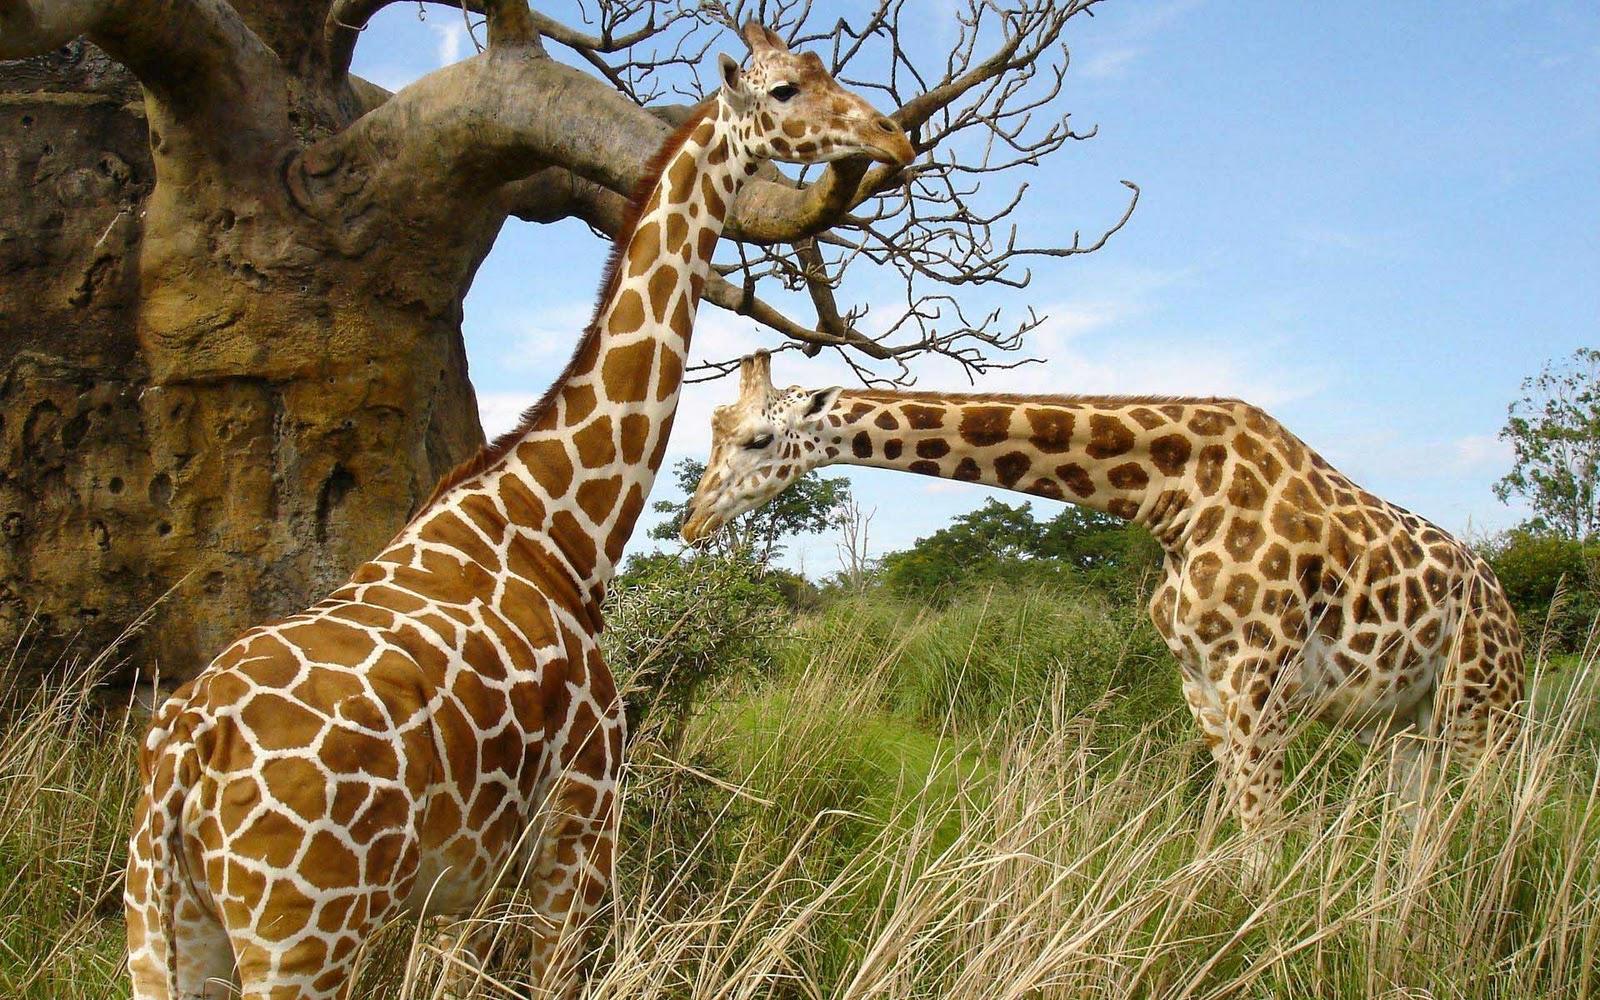 http://4.bp.blogspot.com/-x6dMJsqrWLs/T2QxD1XUPxI/AAAAAAAABv4/Zrw2d6SkntI/s1600/giraffe+2.jpg